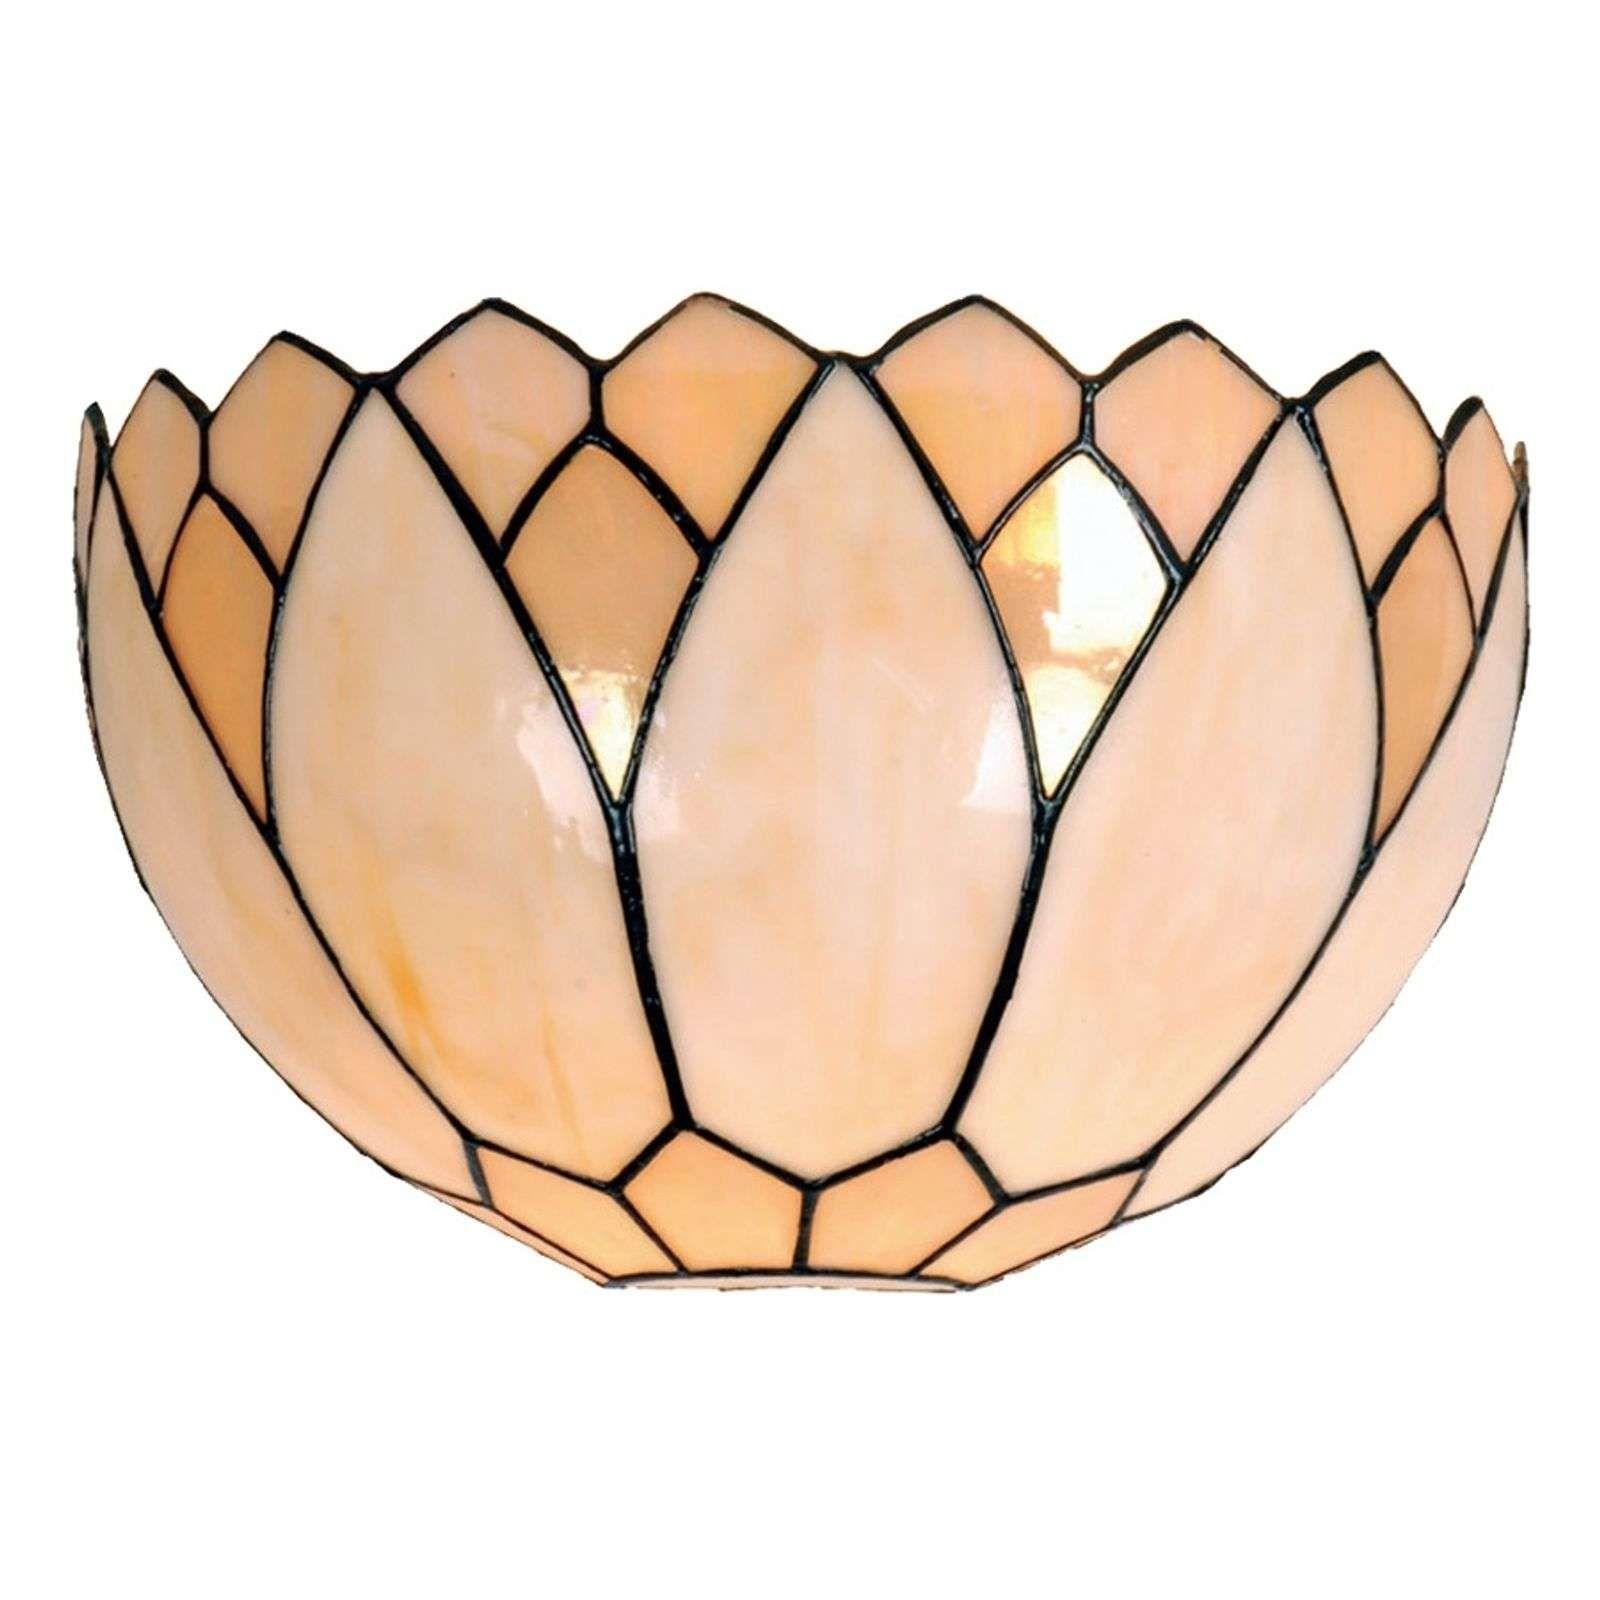 Liliana wandlamp in Tiffany stijl en 2020 | Lampes tiffany